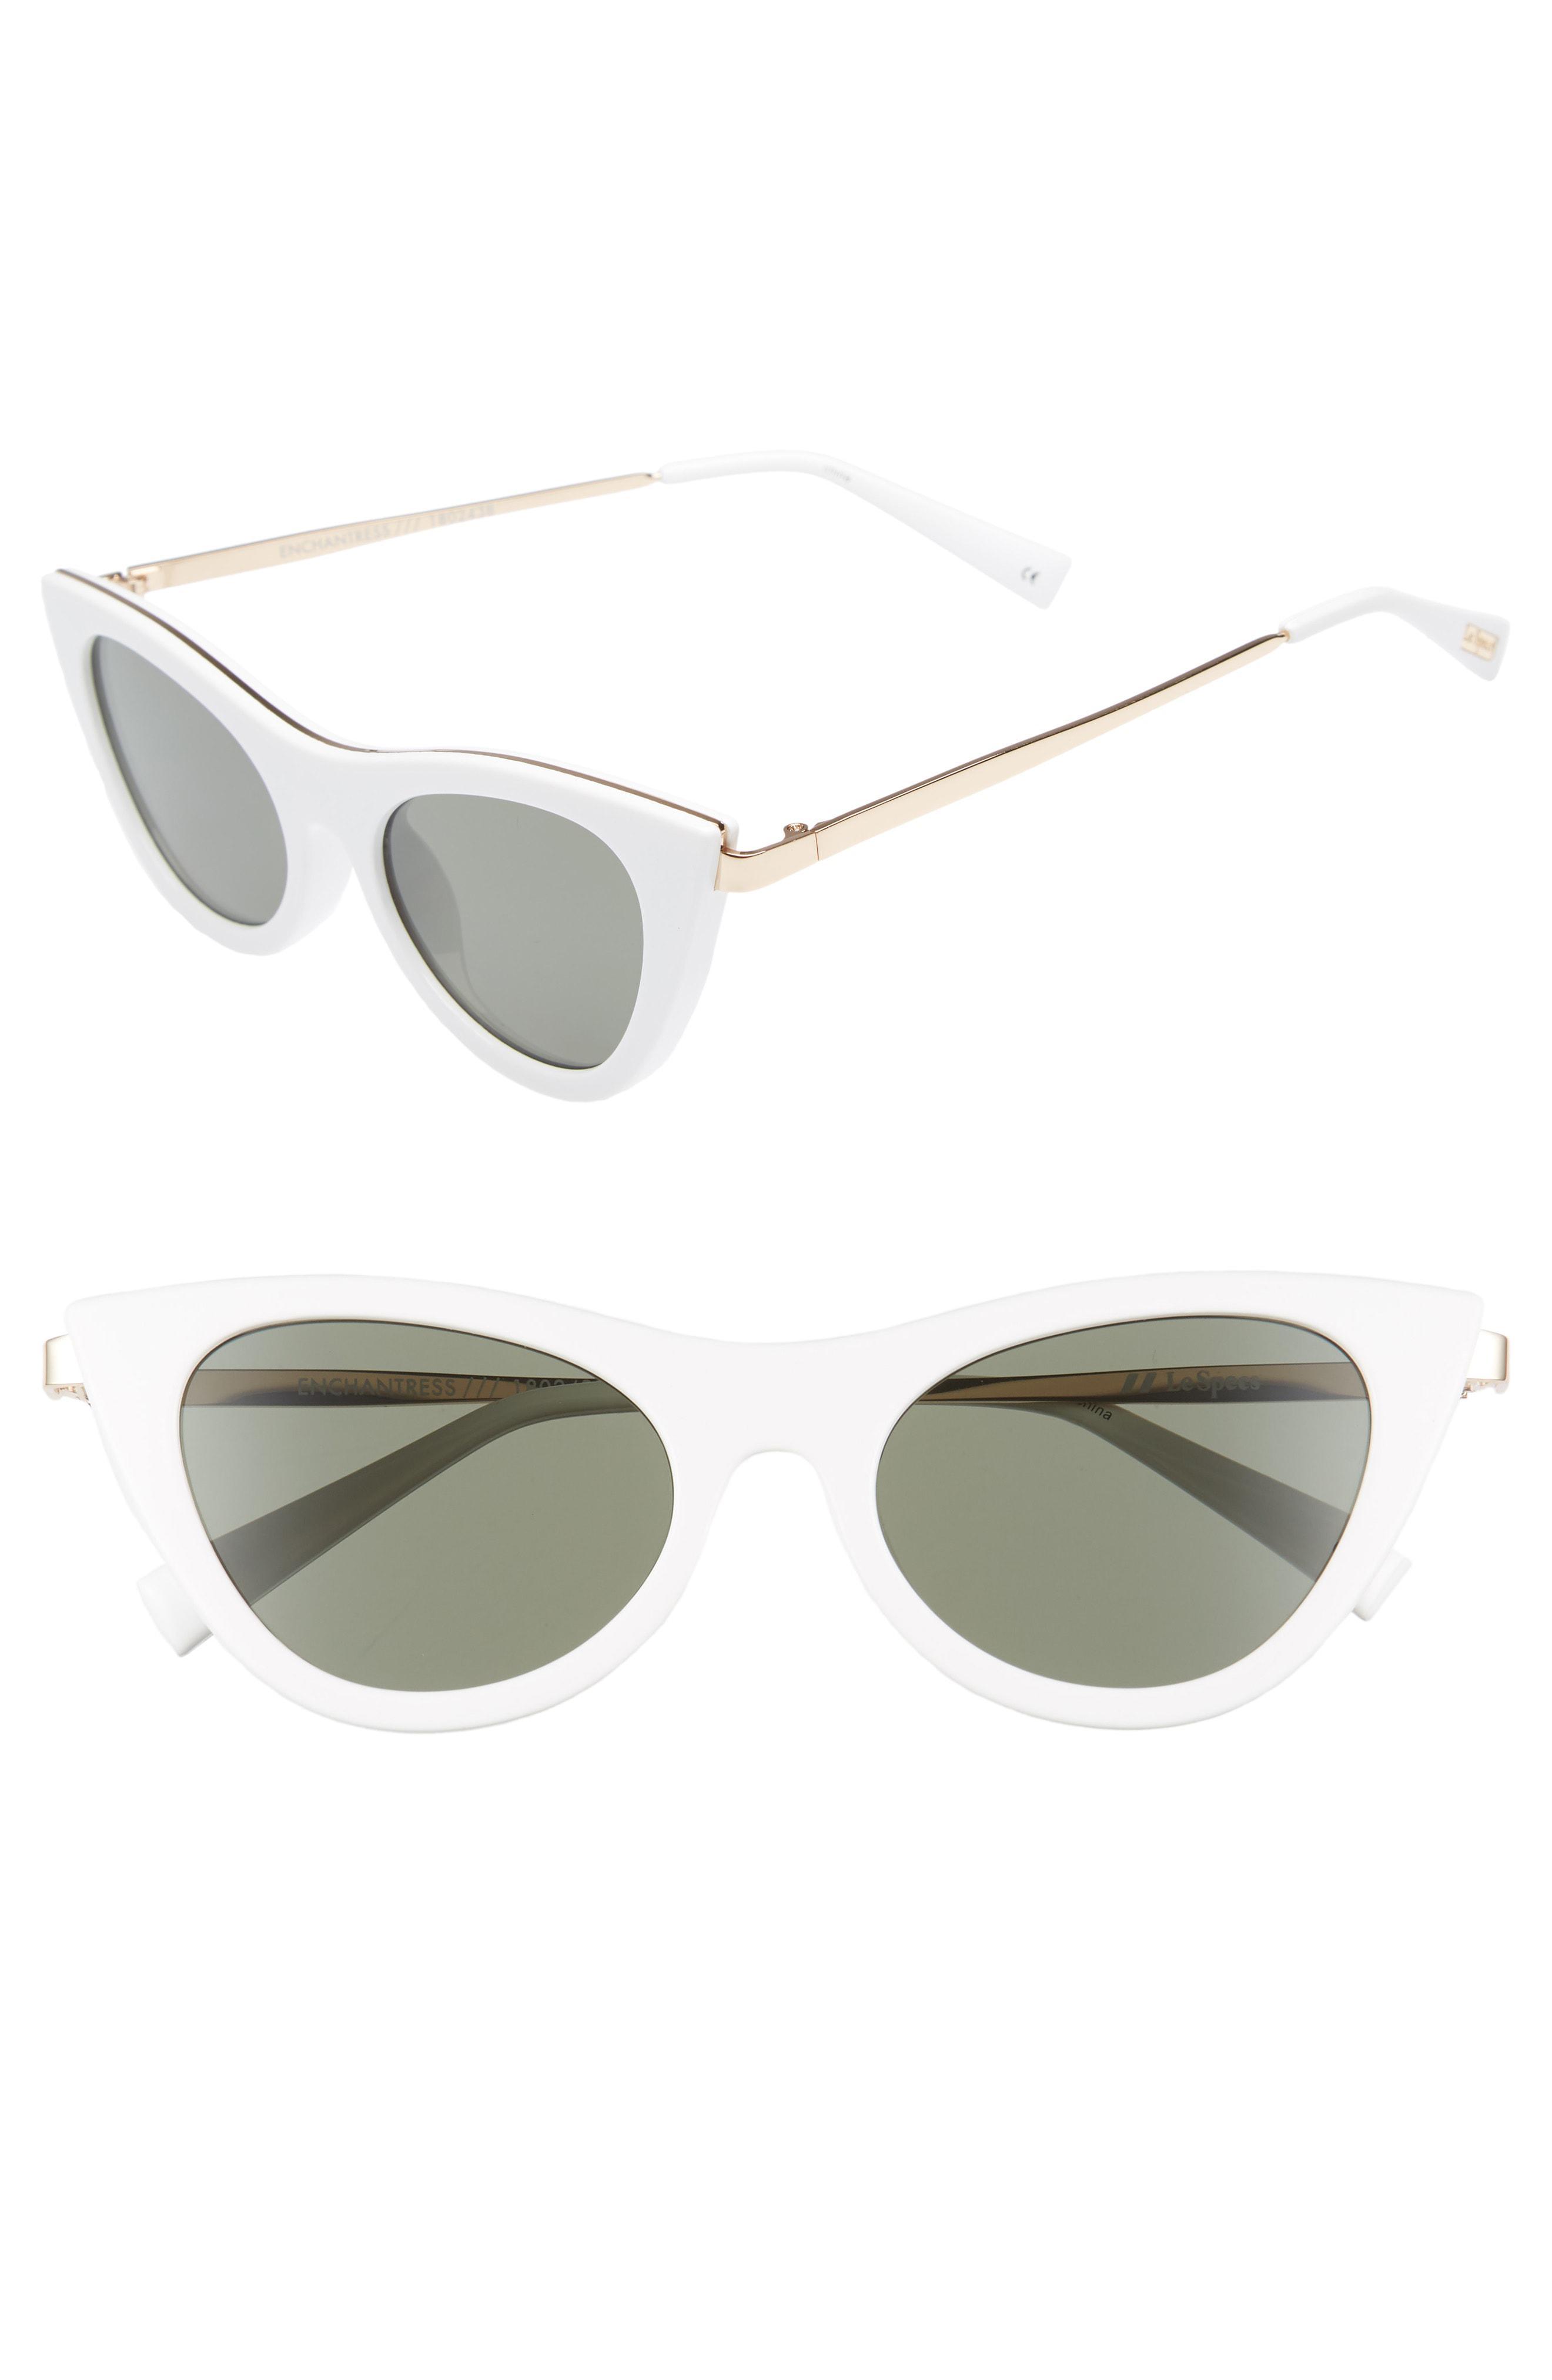 0ef0bc3370 Le Specs Enchantress 50mm Cat Eye Sunglasses in White - Lyst